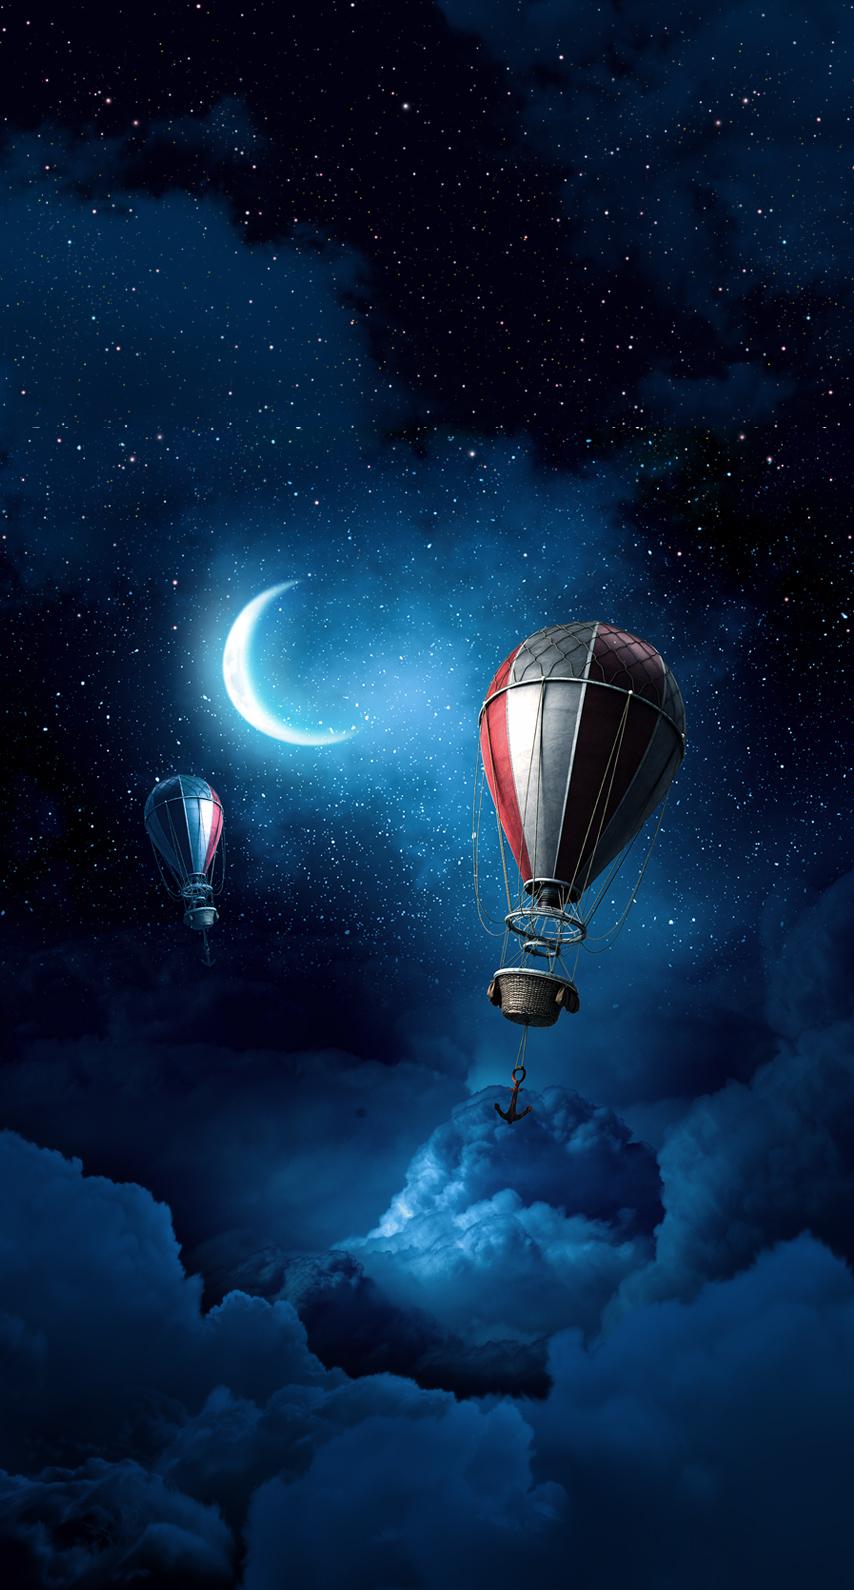 exploration, atmosphere